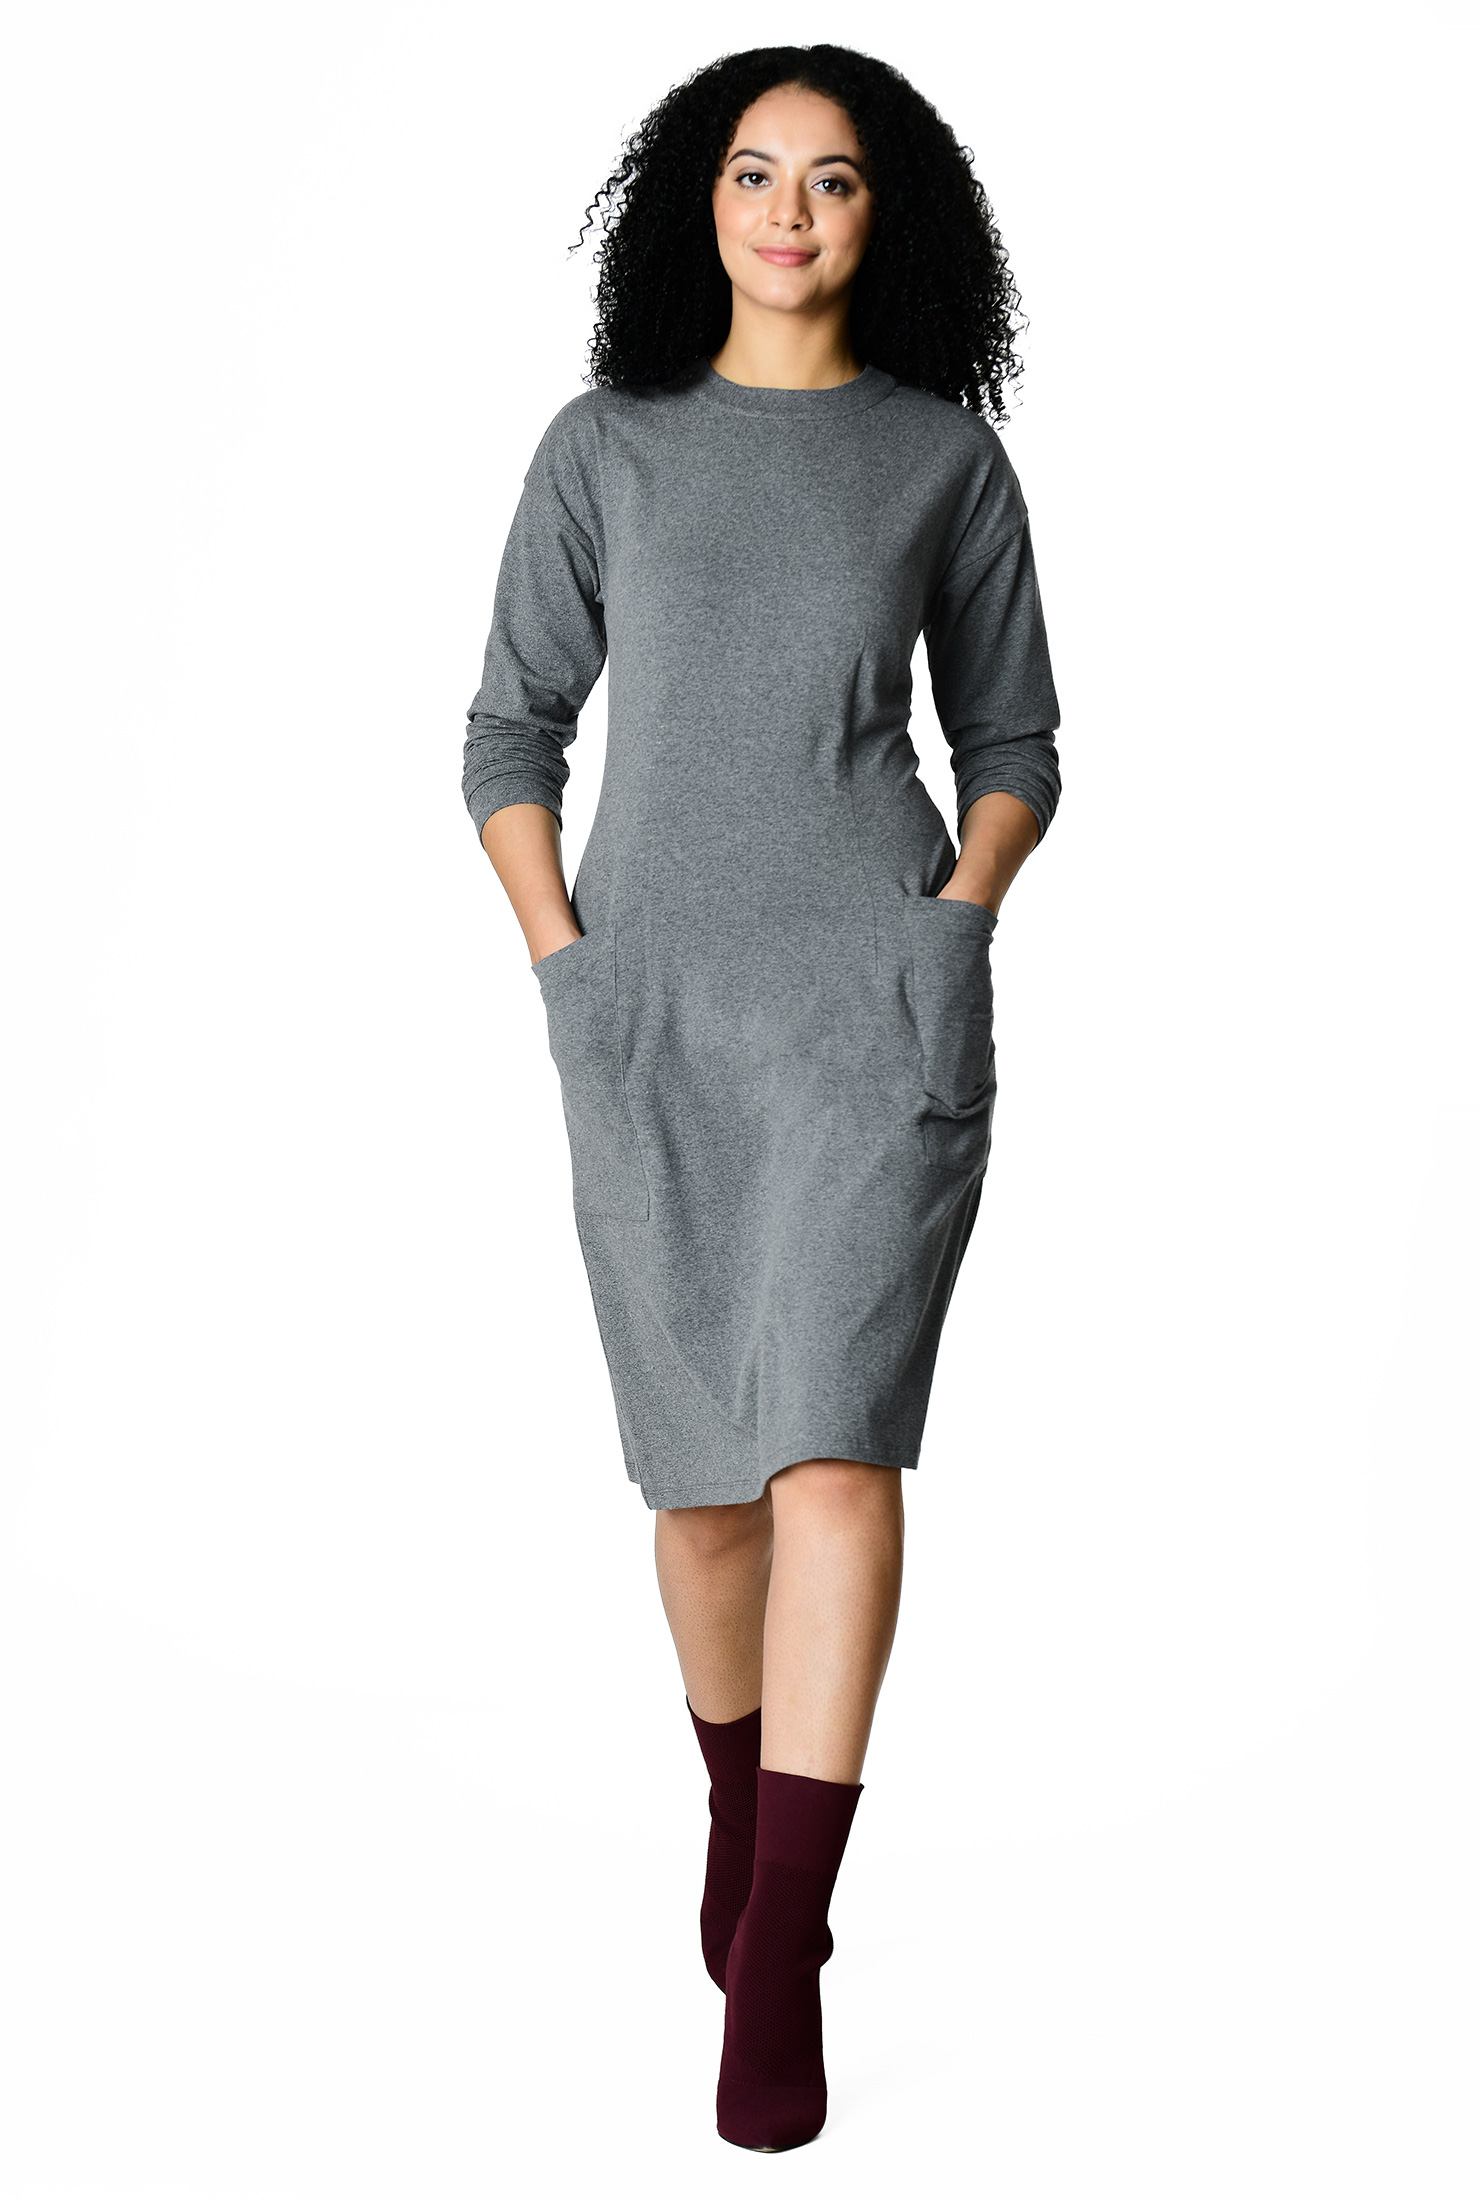 53e443f8b below knee length dresses, Charcoal Dresses, cotton/spandex Dresses, dolman  sleeve